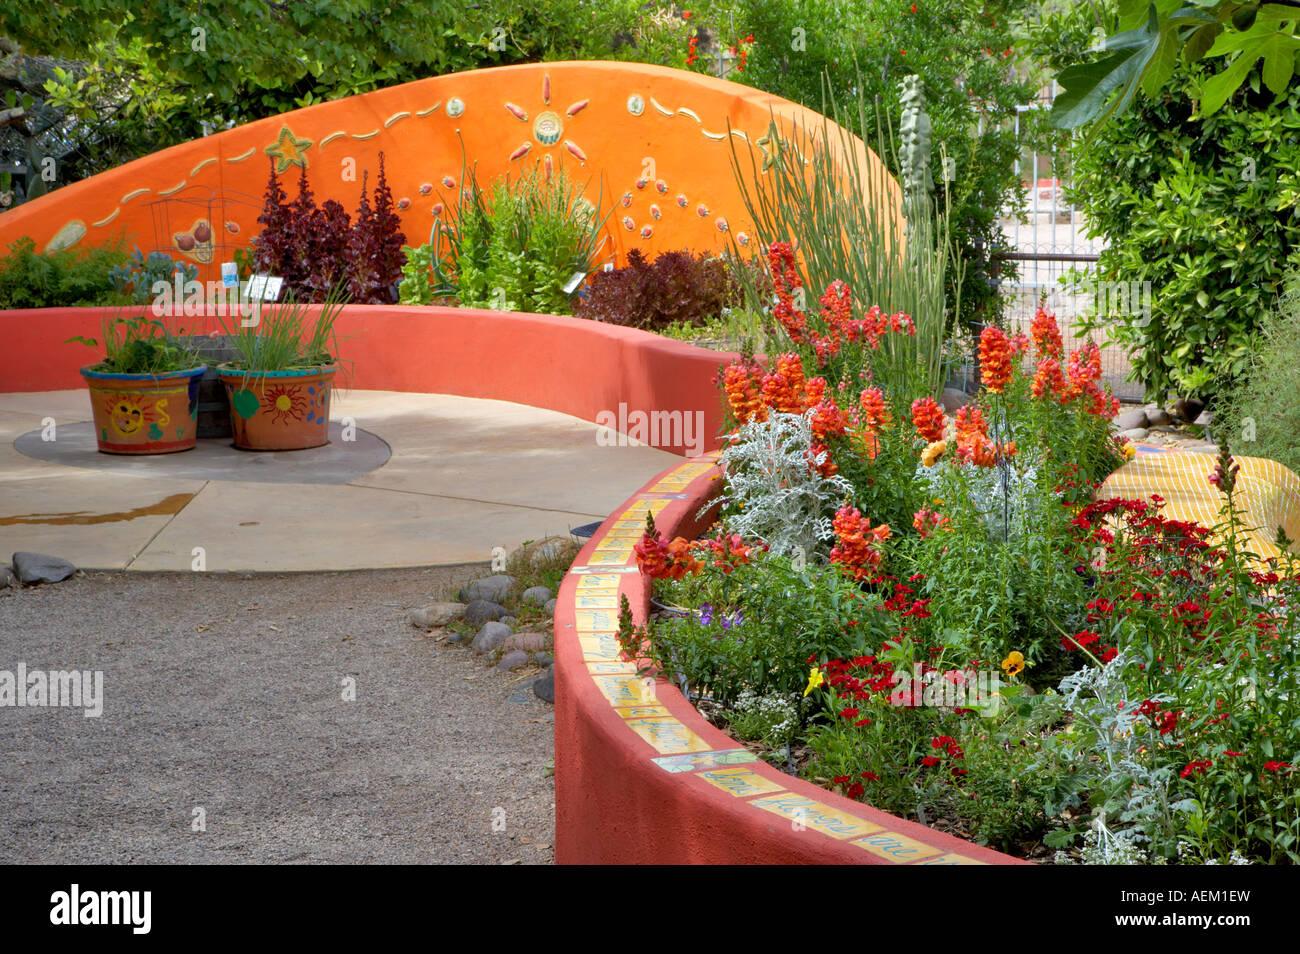 Garden Structure In Tucson Botanical Gardens Tucson Arizona